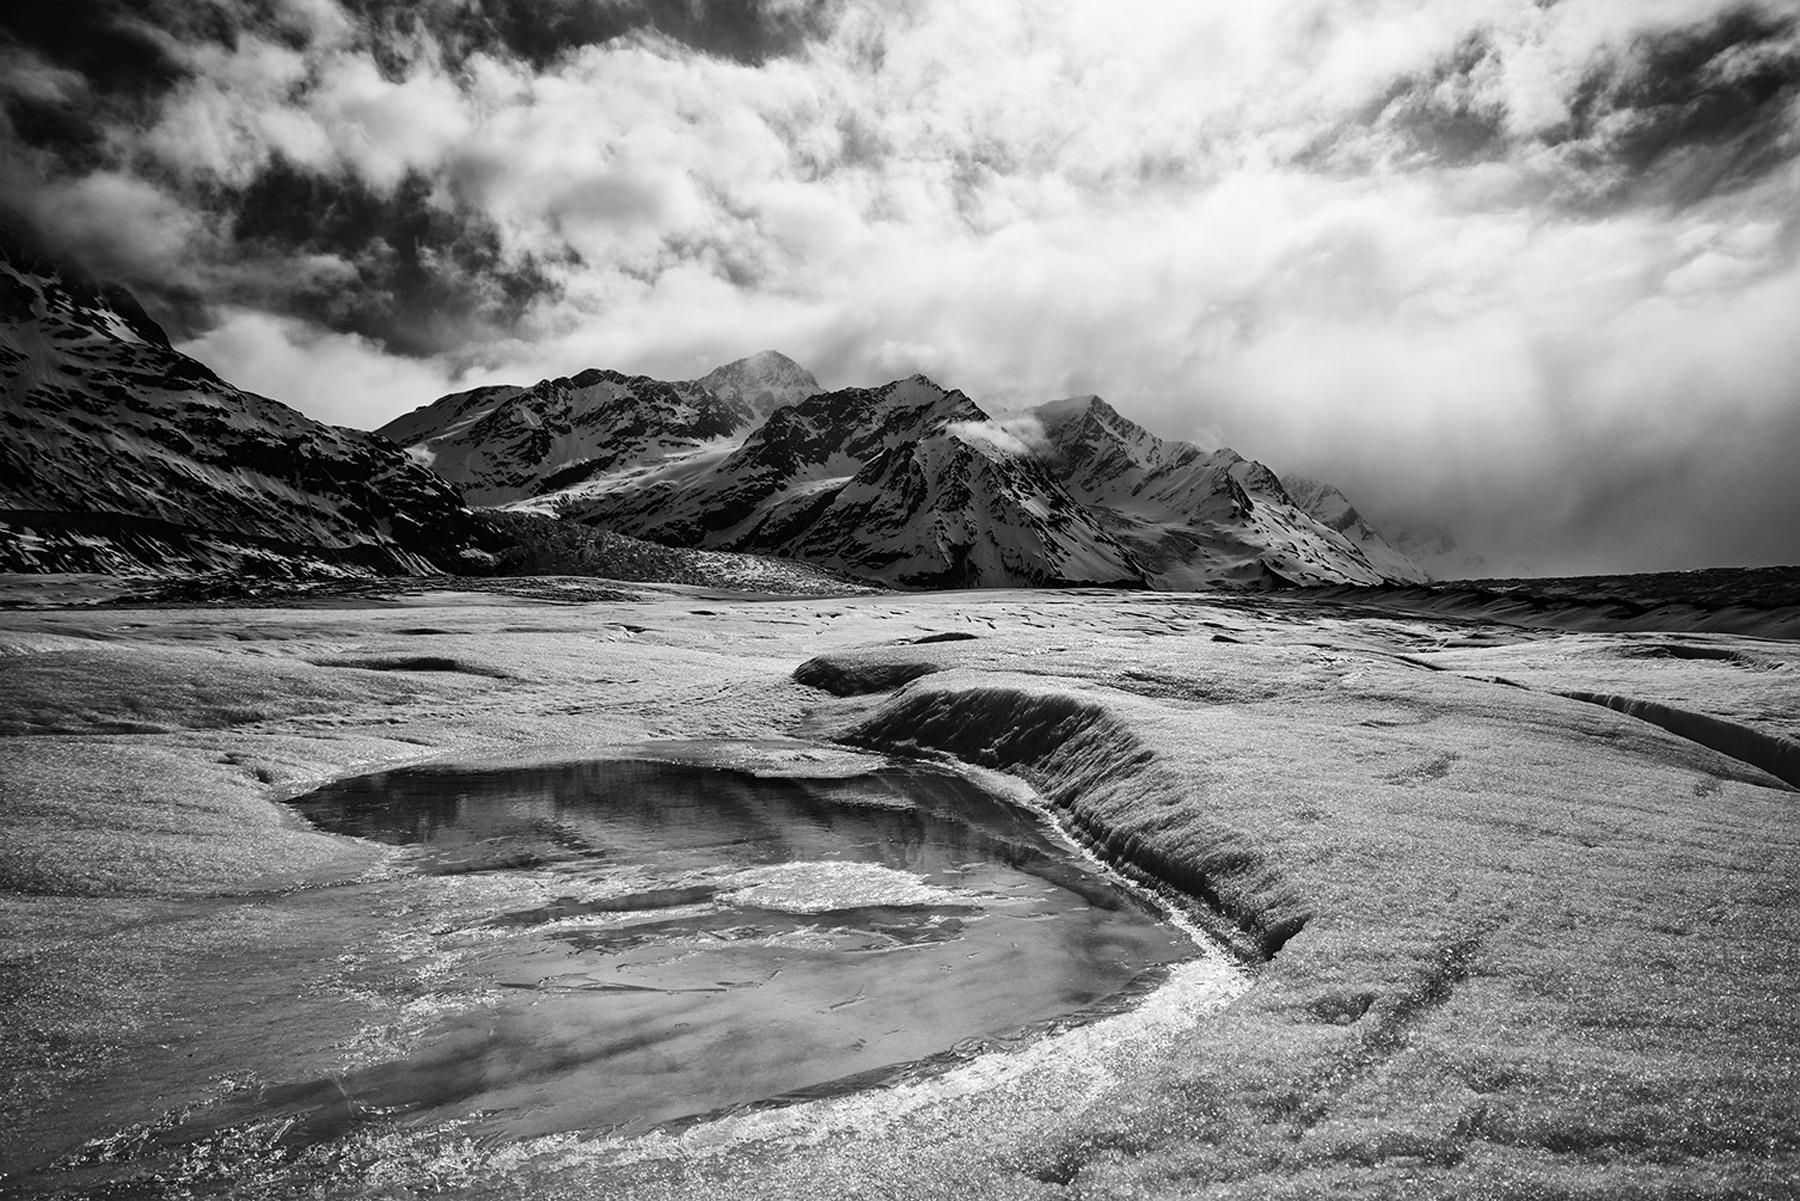 Jean-Paul de Jager: Alaska 4